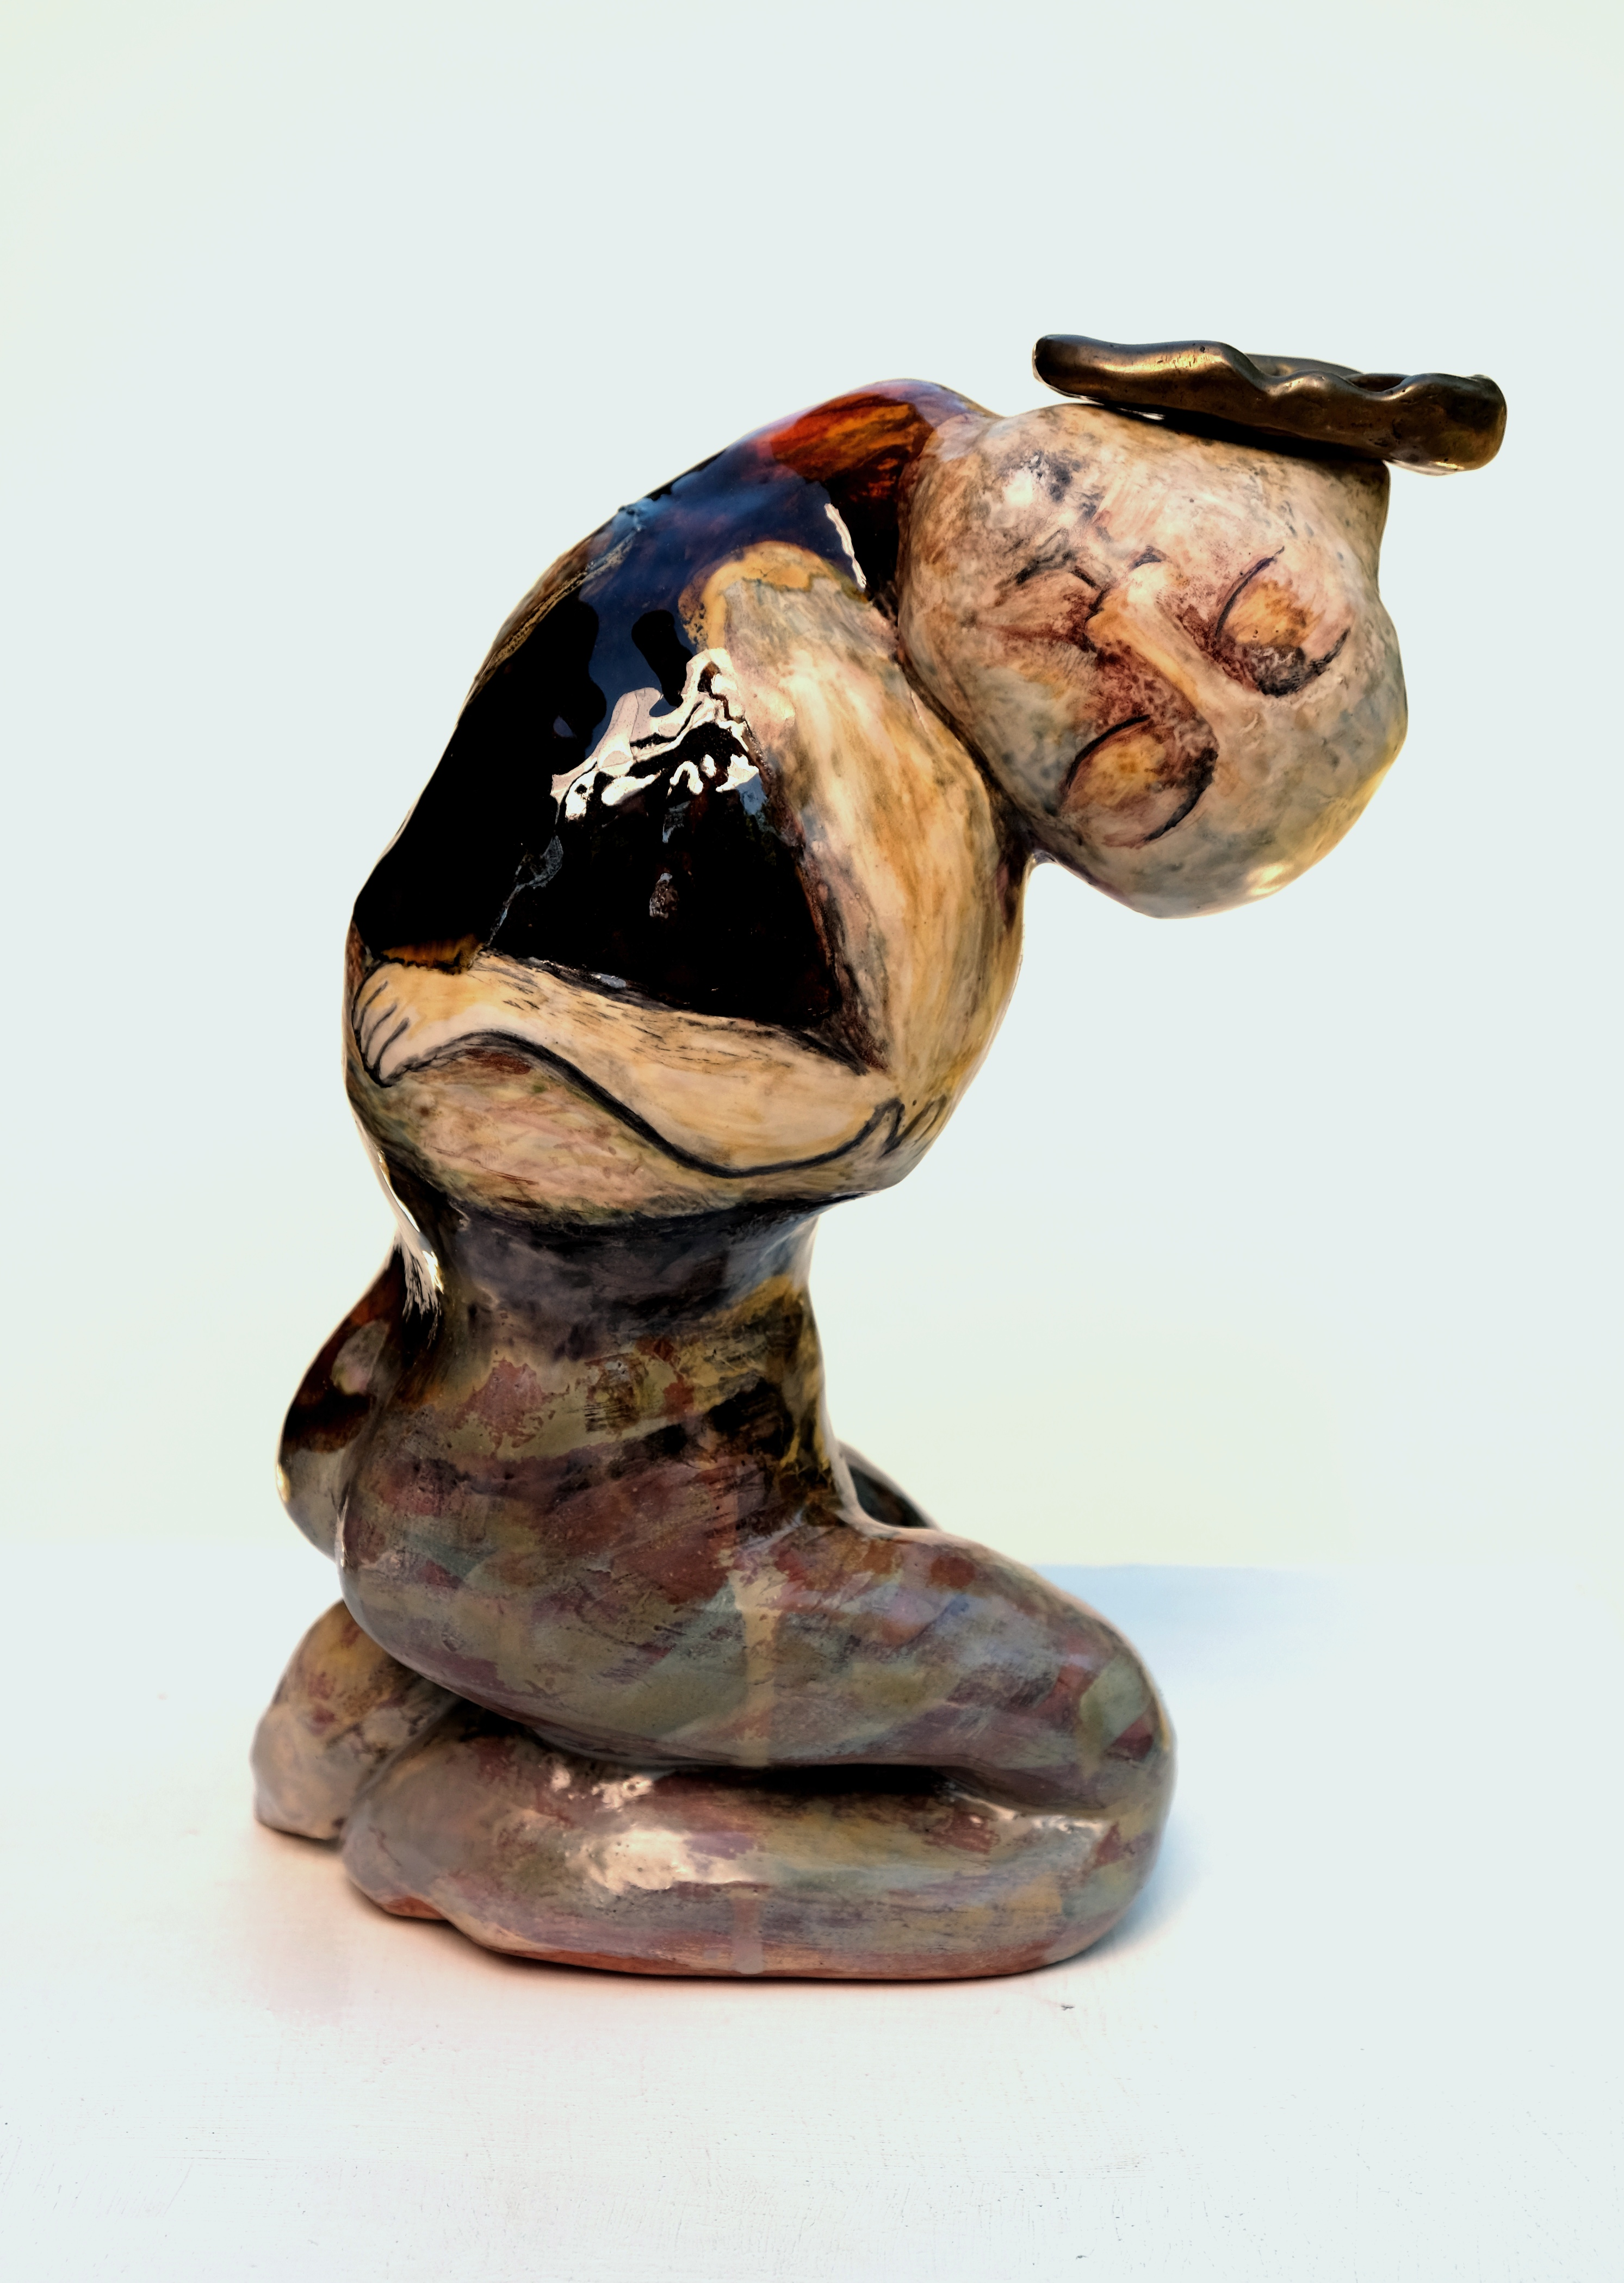 Foetus adulte I, 30x20x10 cm, vend